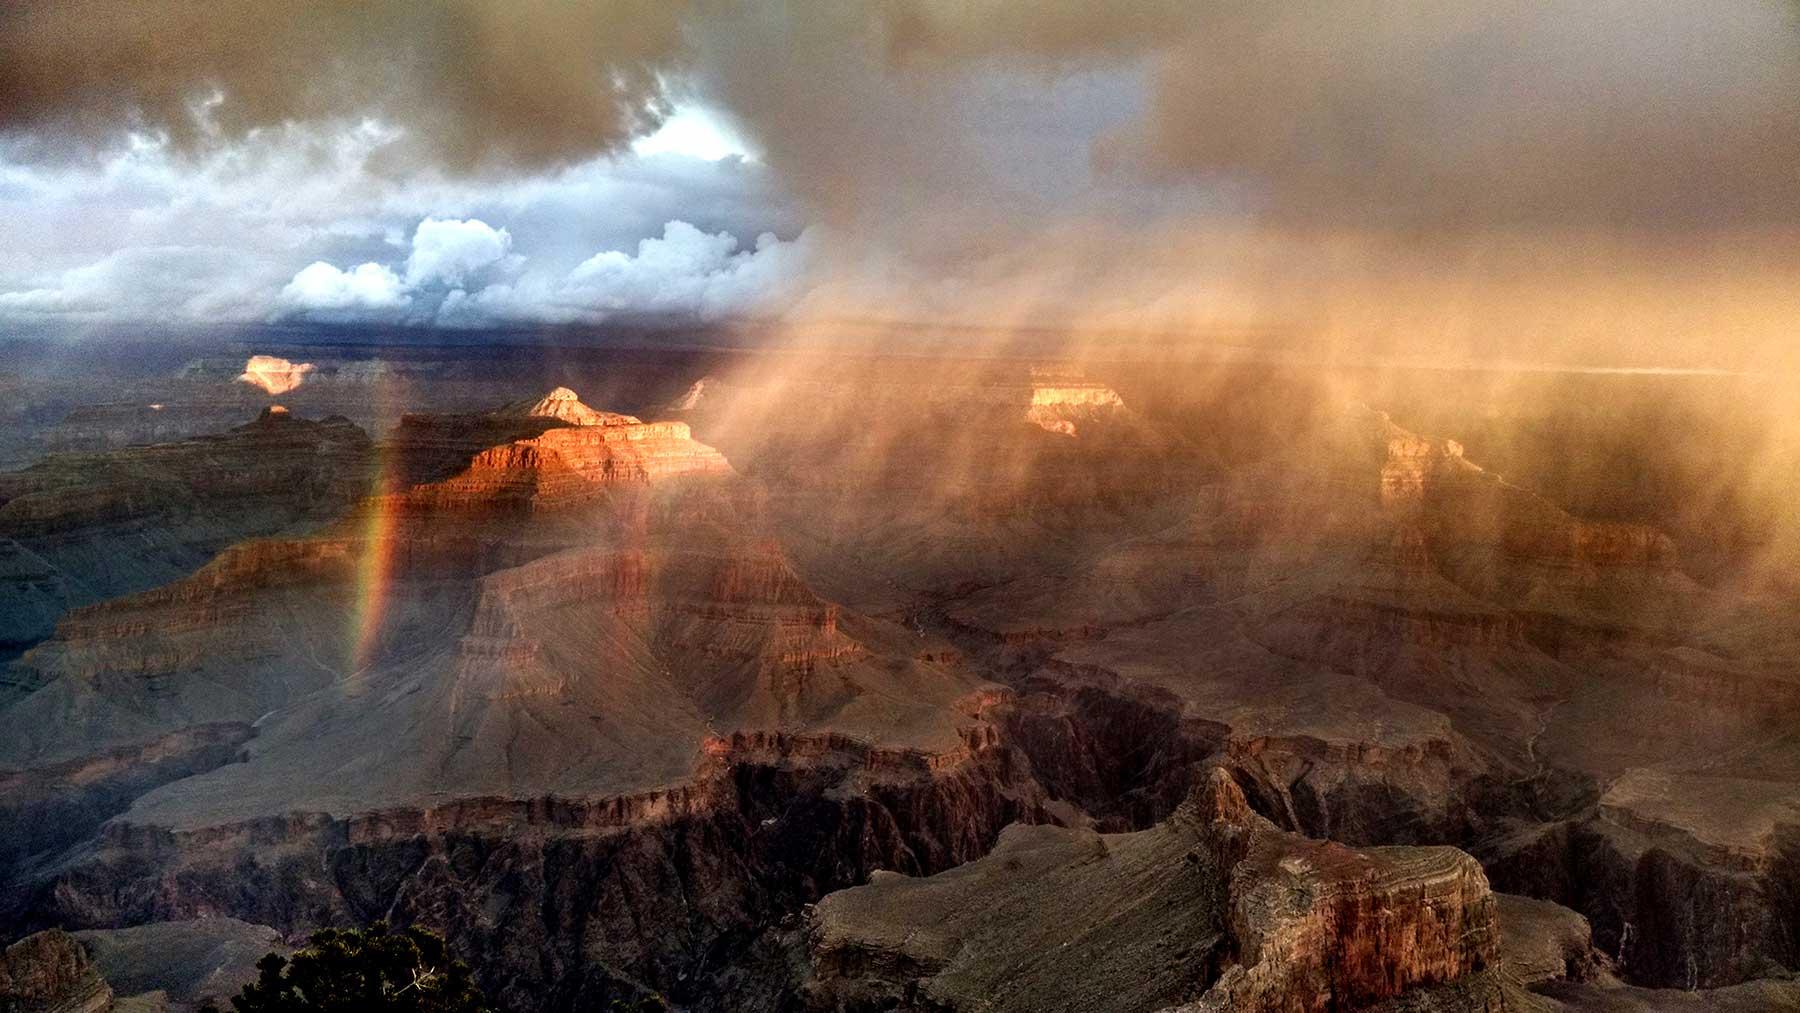 GC-Sunrise-Hopi-Pt-with-rainbow_grandcanyonlodges.com